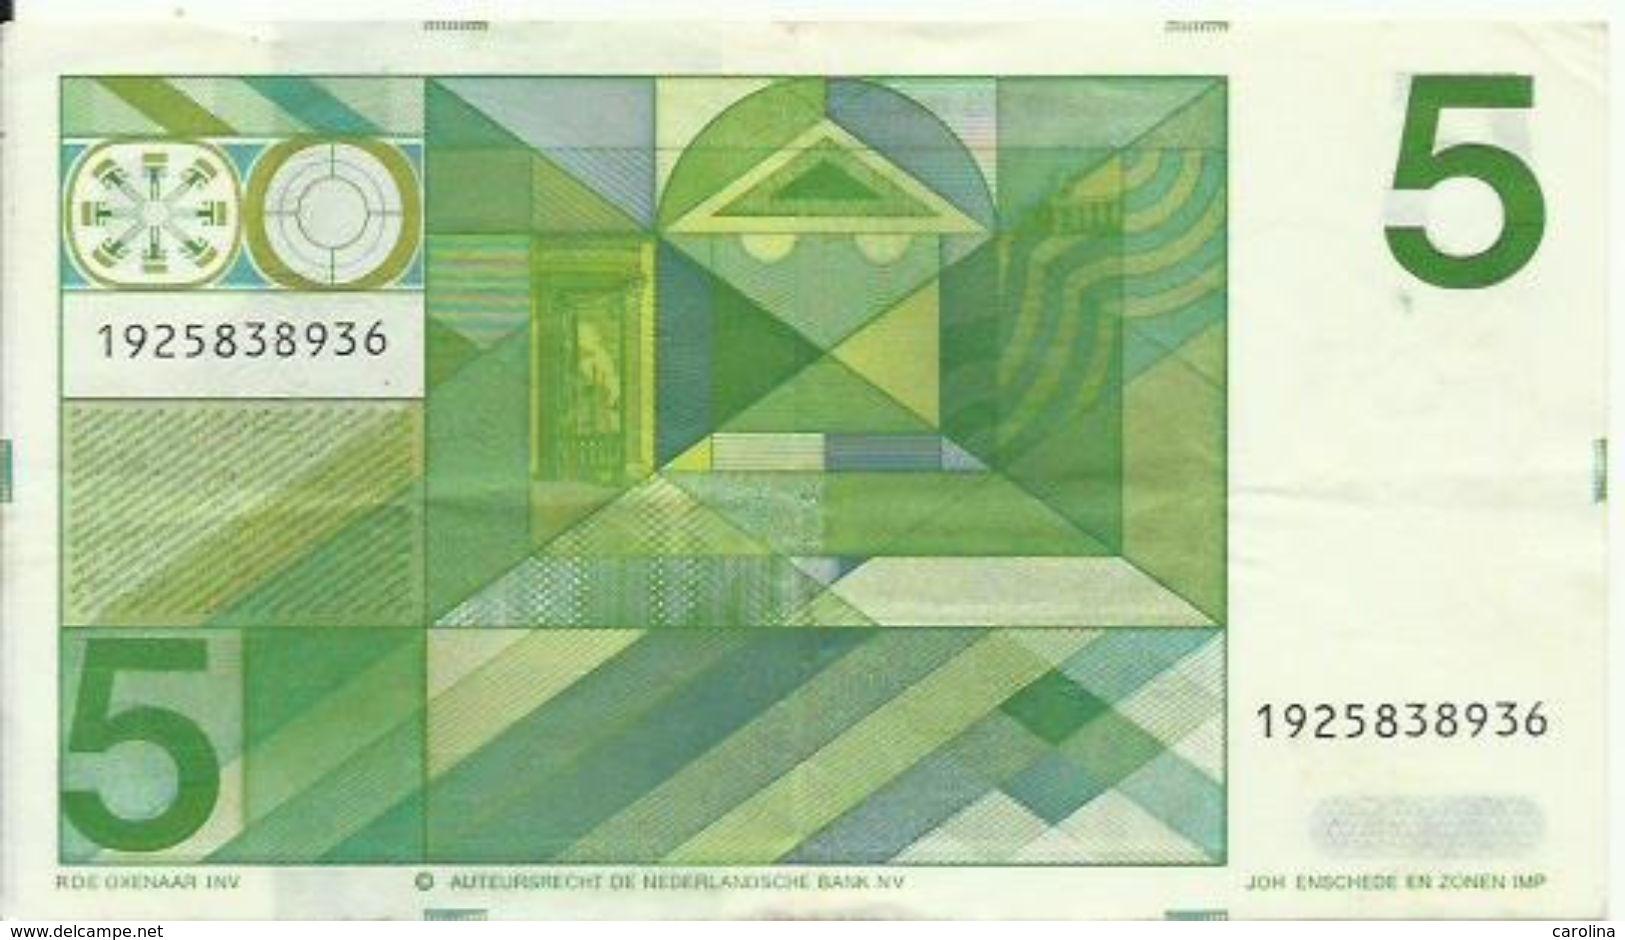 NEDERLAND - 5 GULDEN - 1973 - 1925838936 - SEE PHOTOS - NICE PRICE - 5 Florín Holandés (gulden)